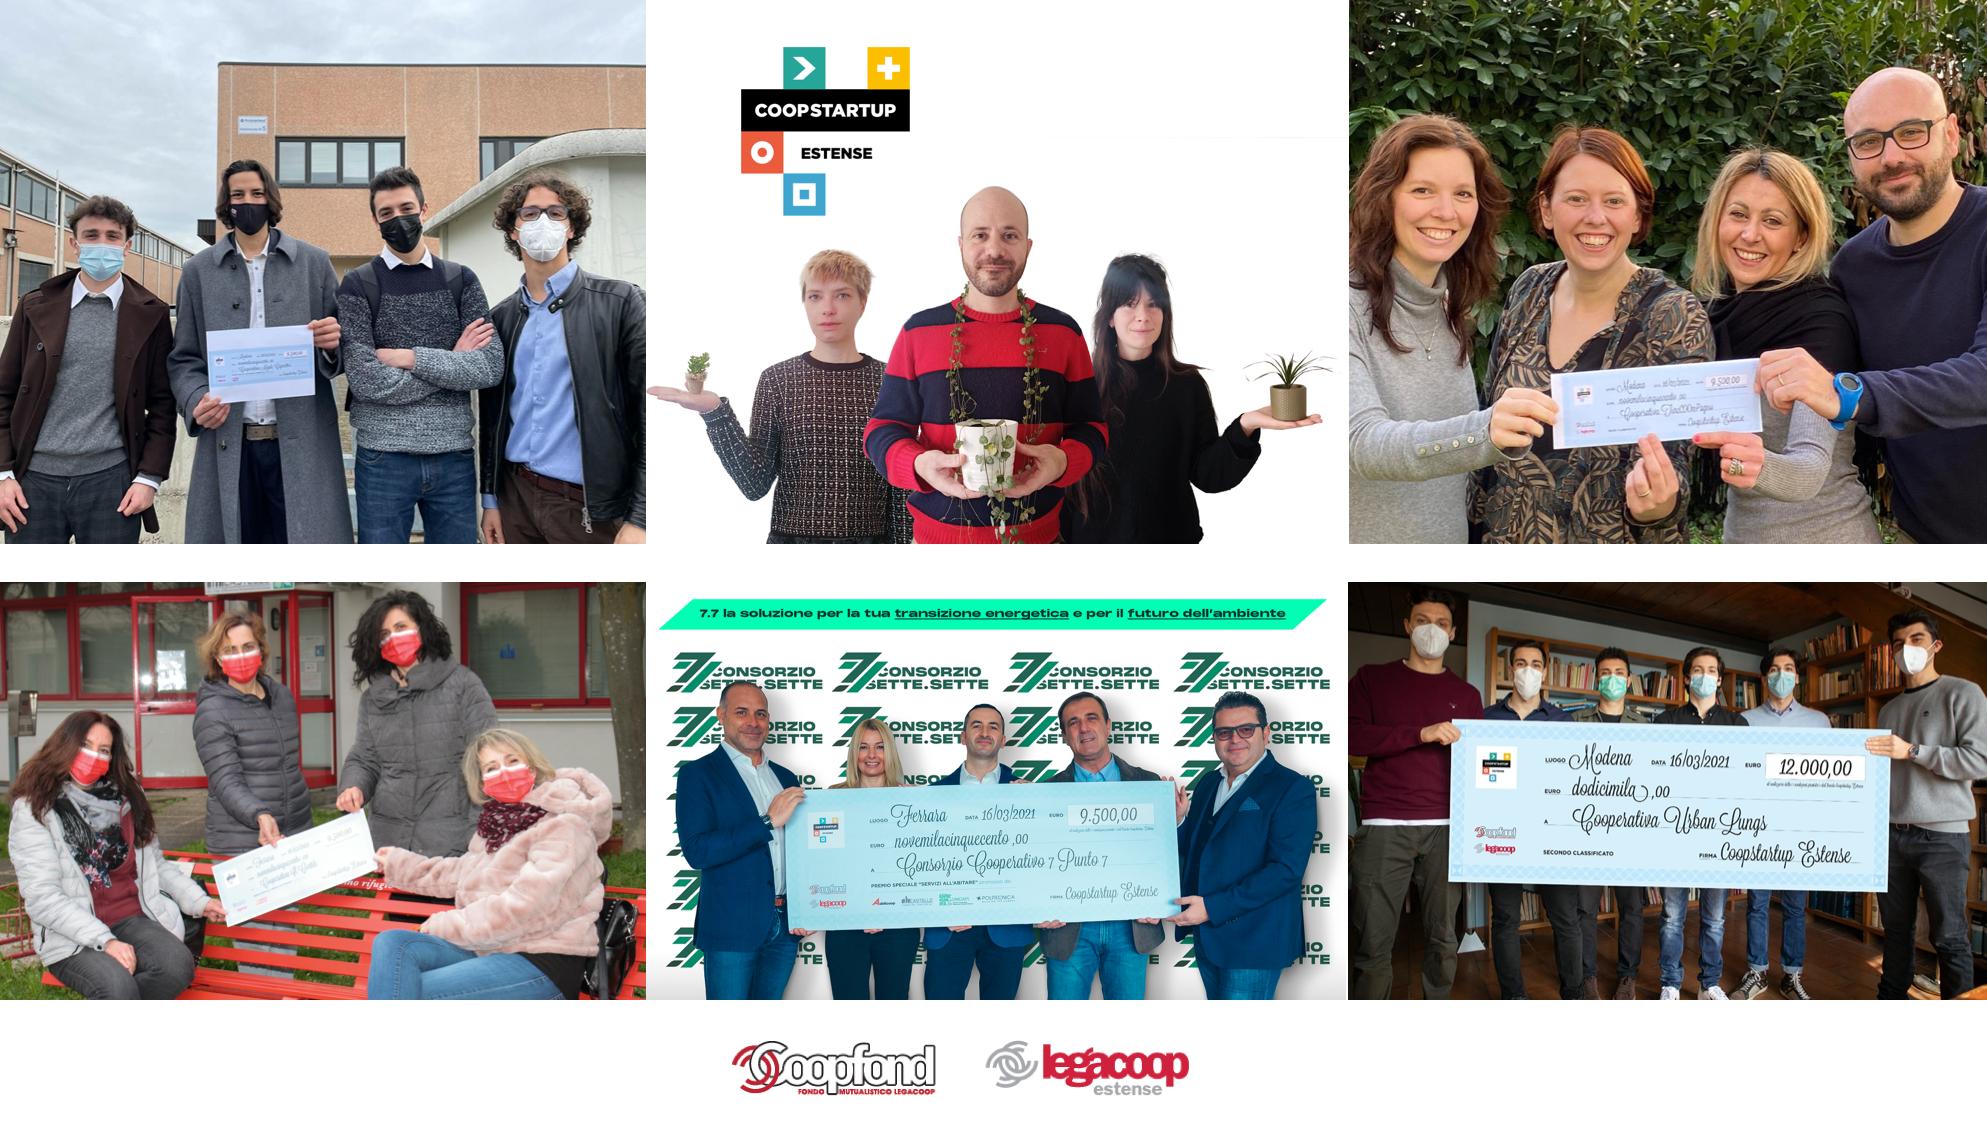 Coopstartup Estense: a Modena e Ferrara nascono 6 nuove startup cooperative